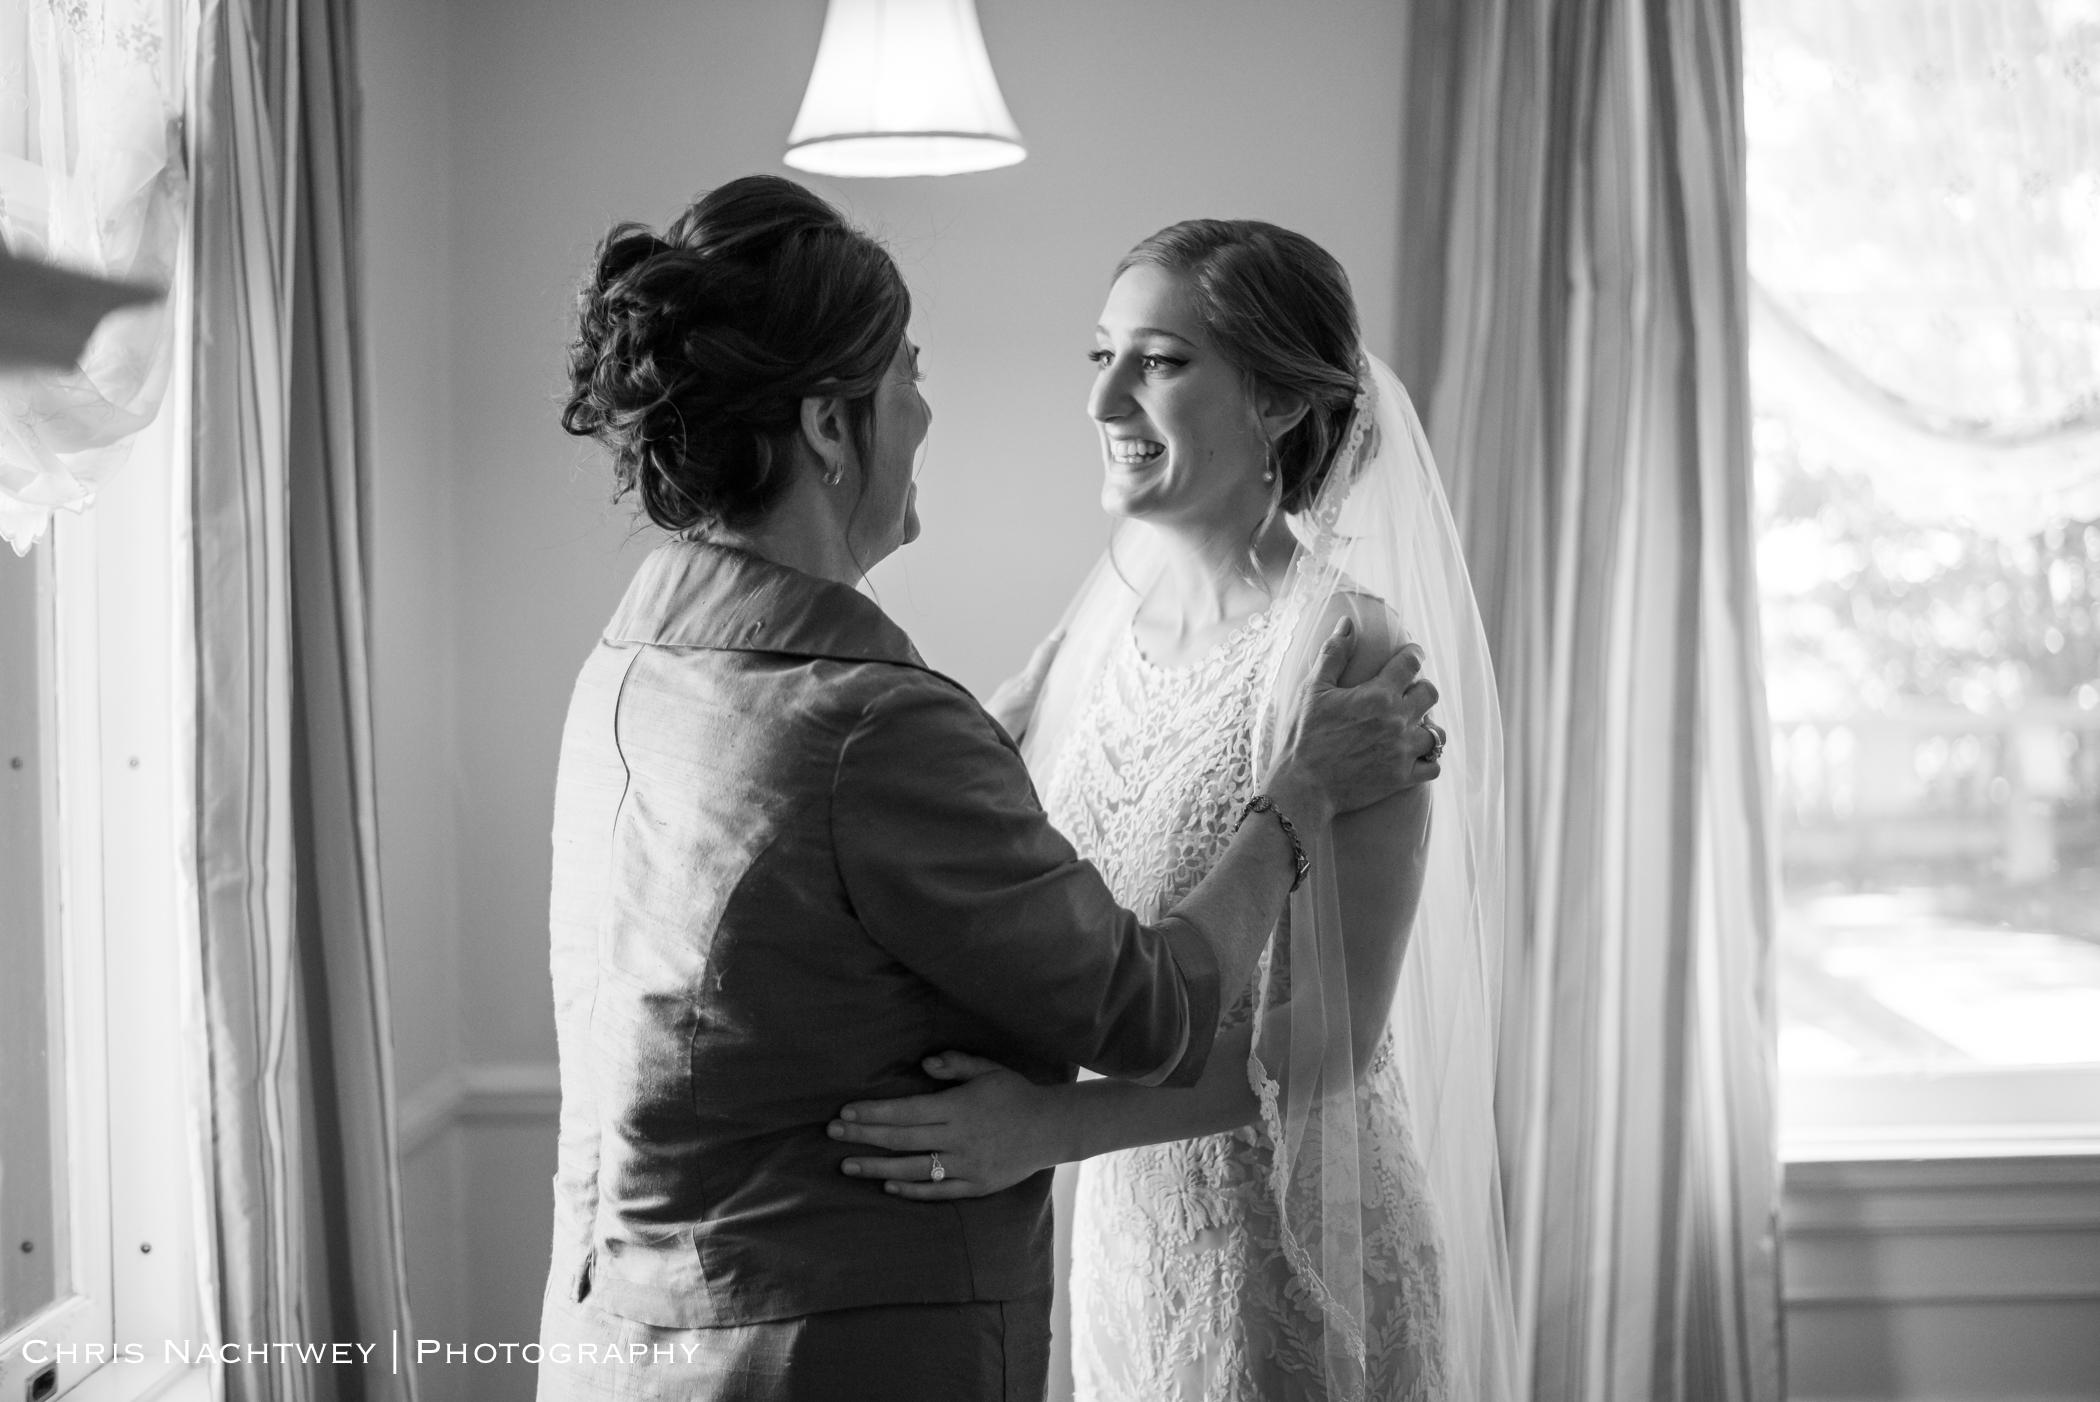 harkness-wedding-photos-chris-nachtwey-photography-2018-10.jpg